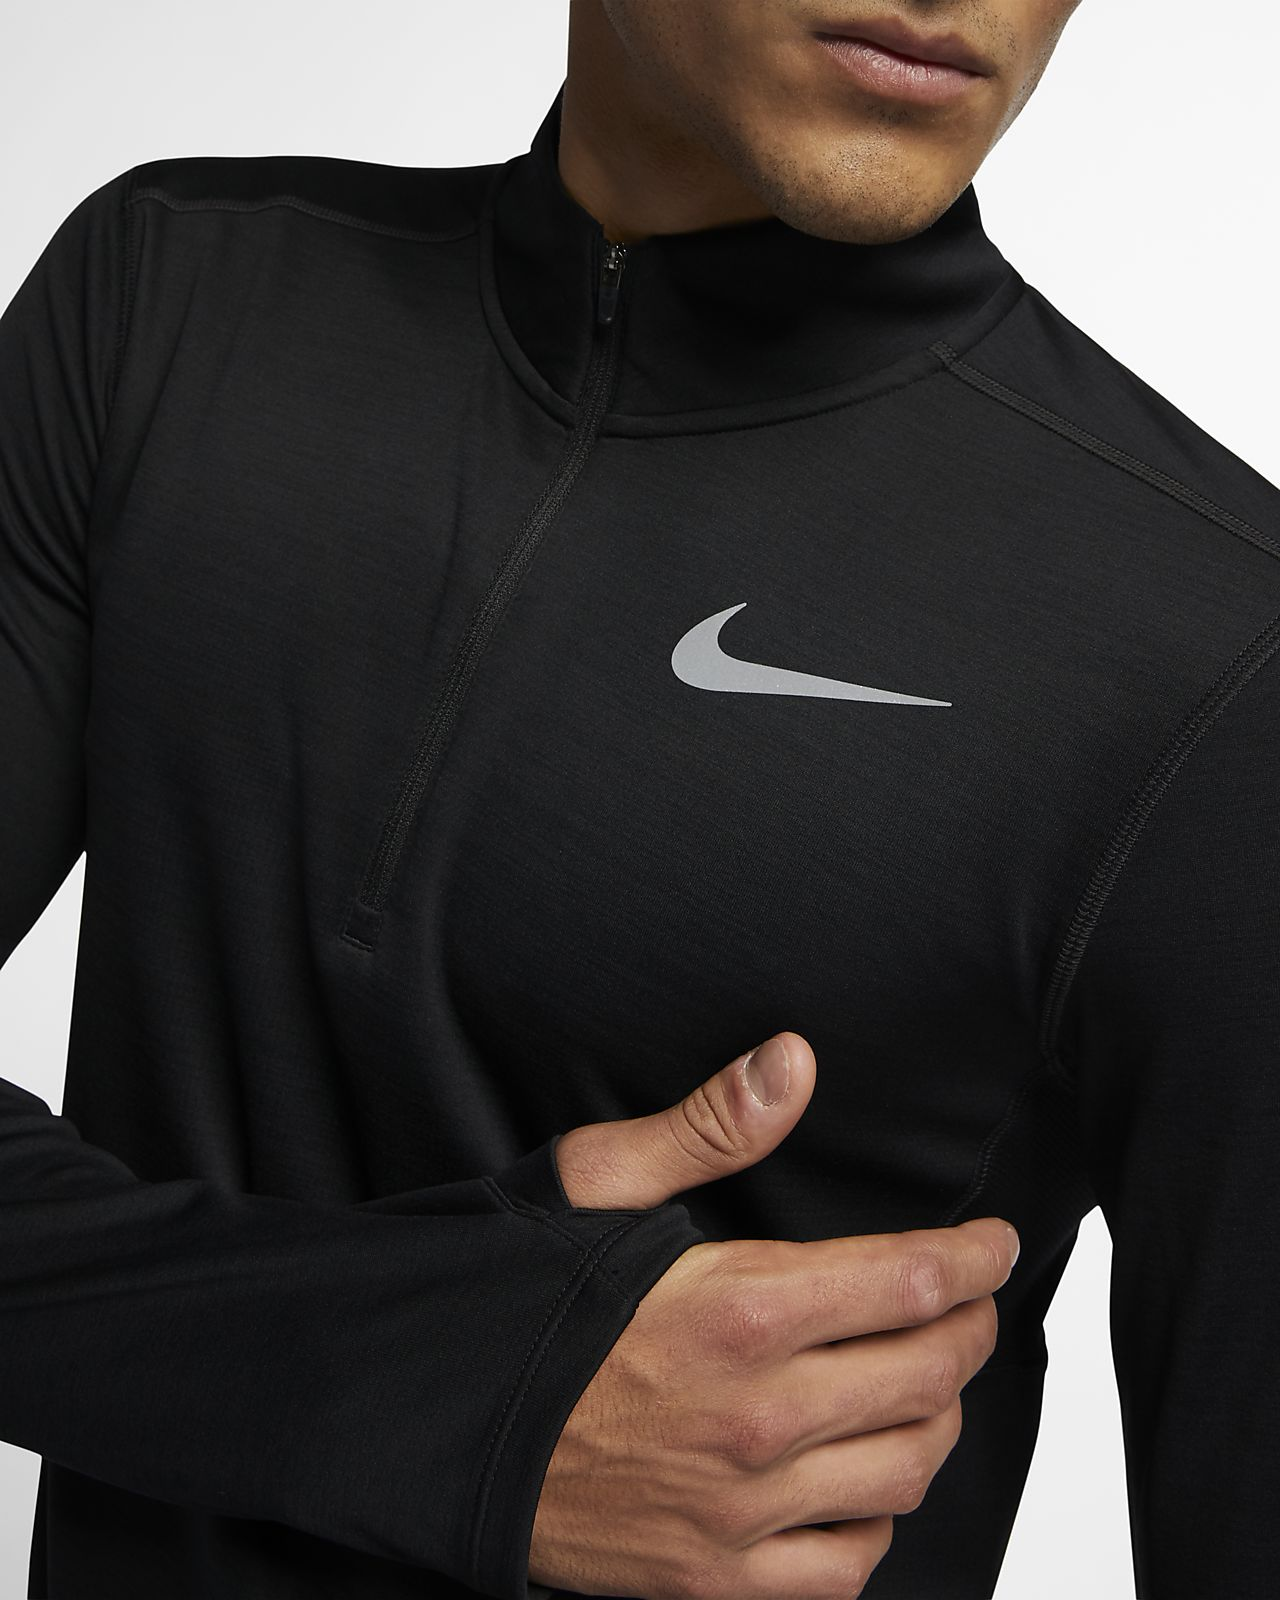 74e7c2d44 Męska koszulka do biegania z zamkiem 1/2 Nike Pacer. Nike.com PL